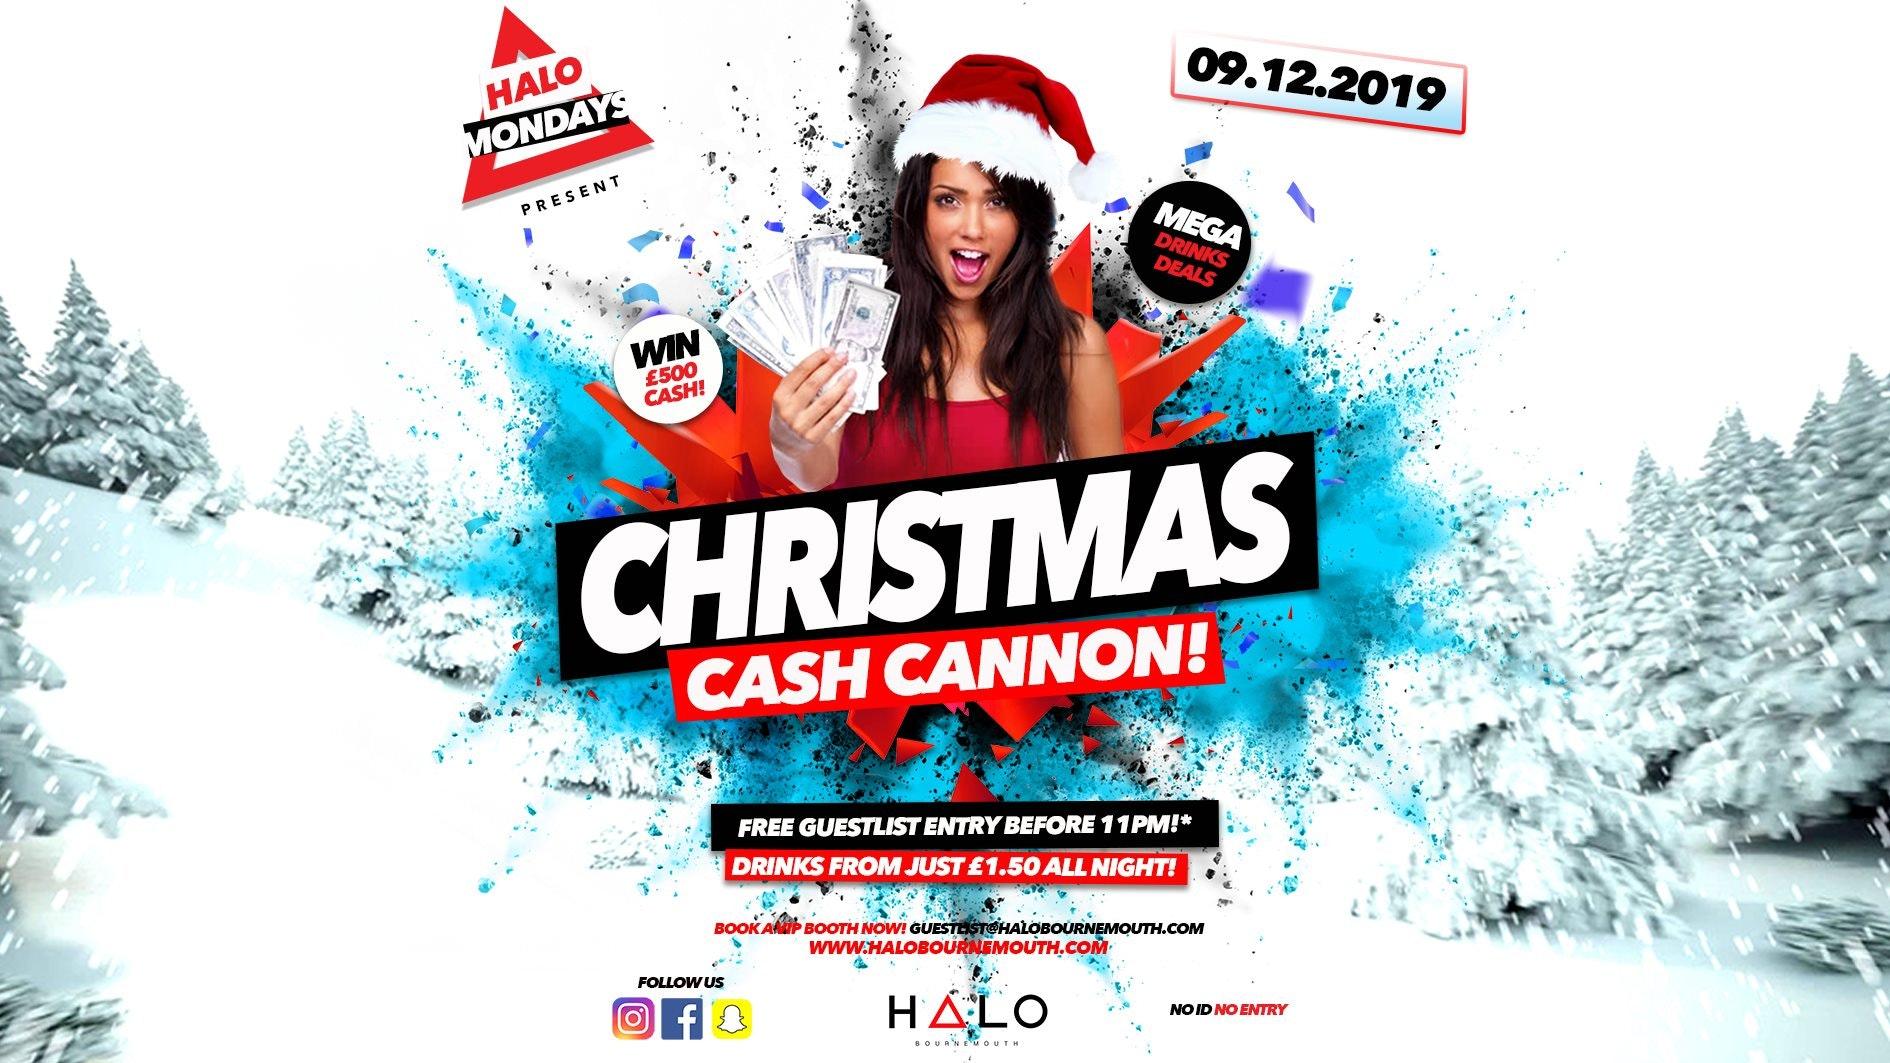 Halo Mondays: Christmas Cash Cannon